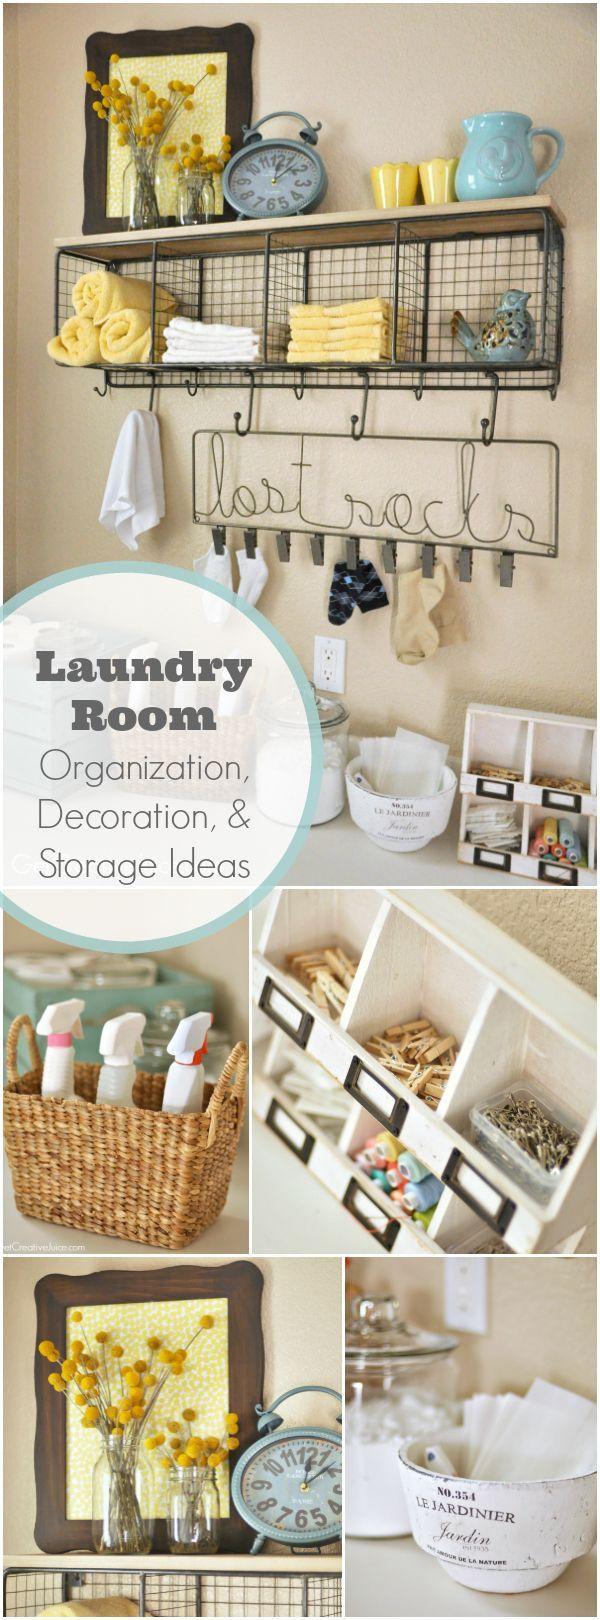 best laundry room images on pinterest laundry room laundry